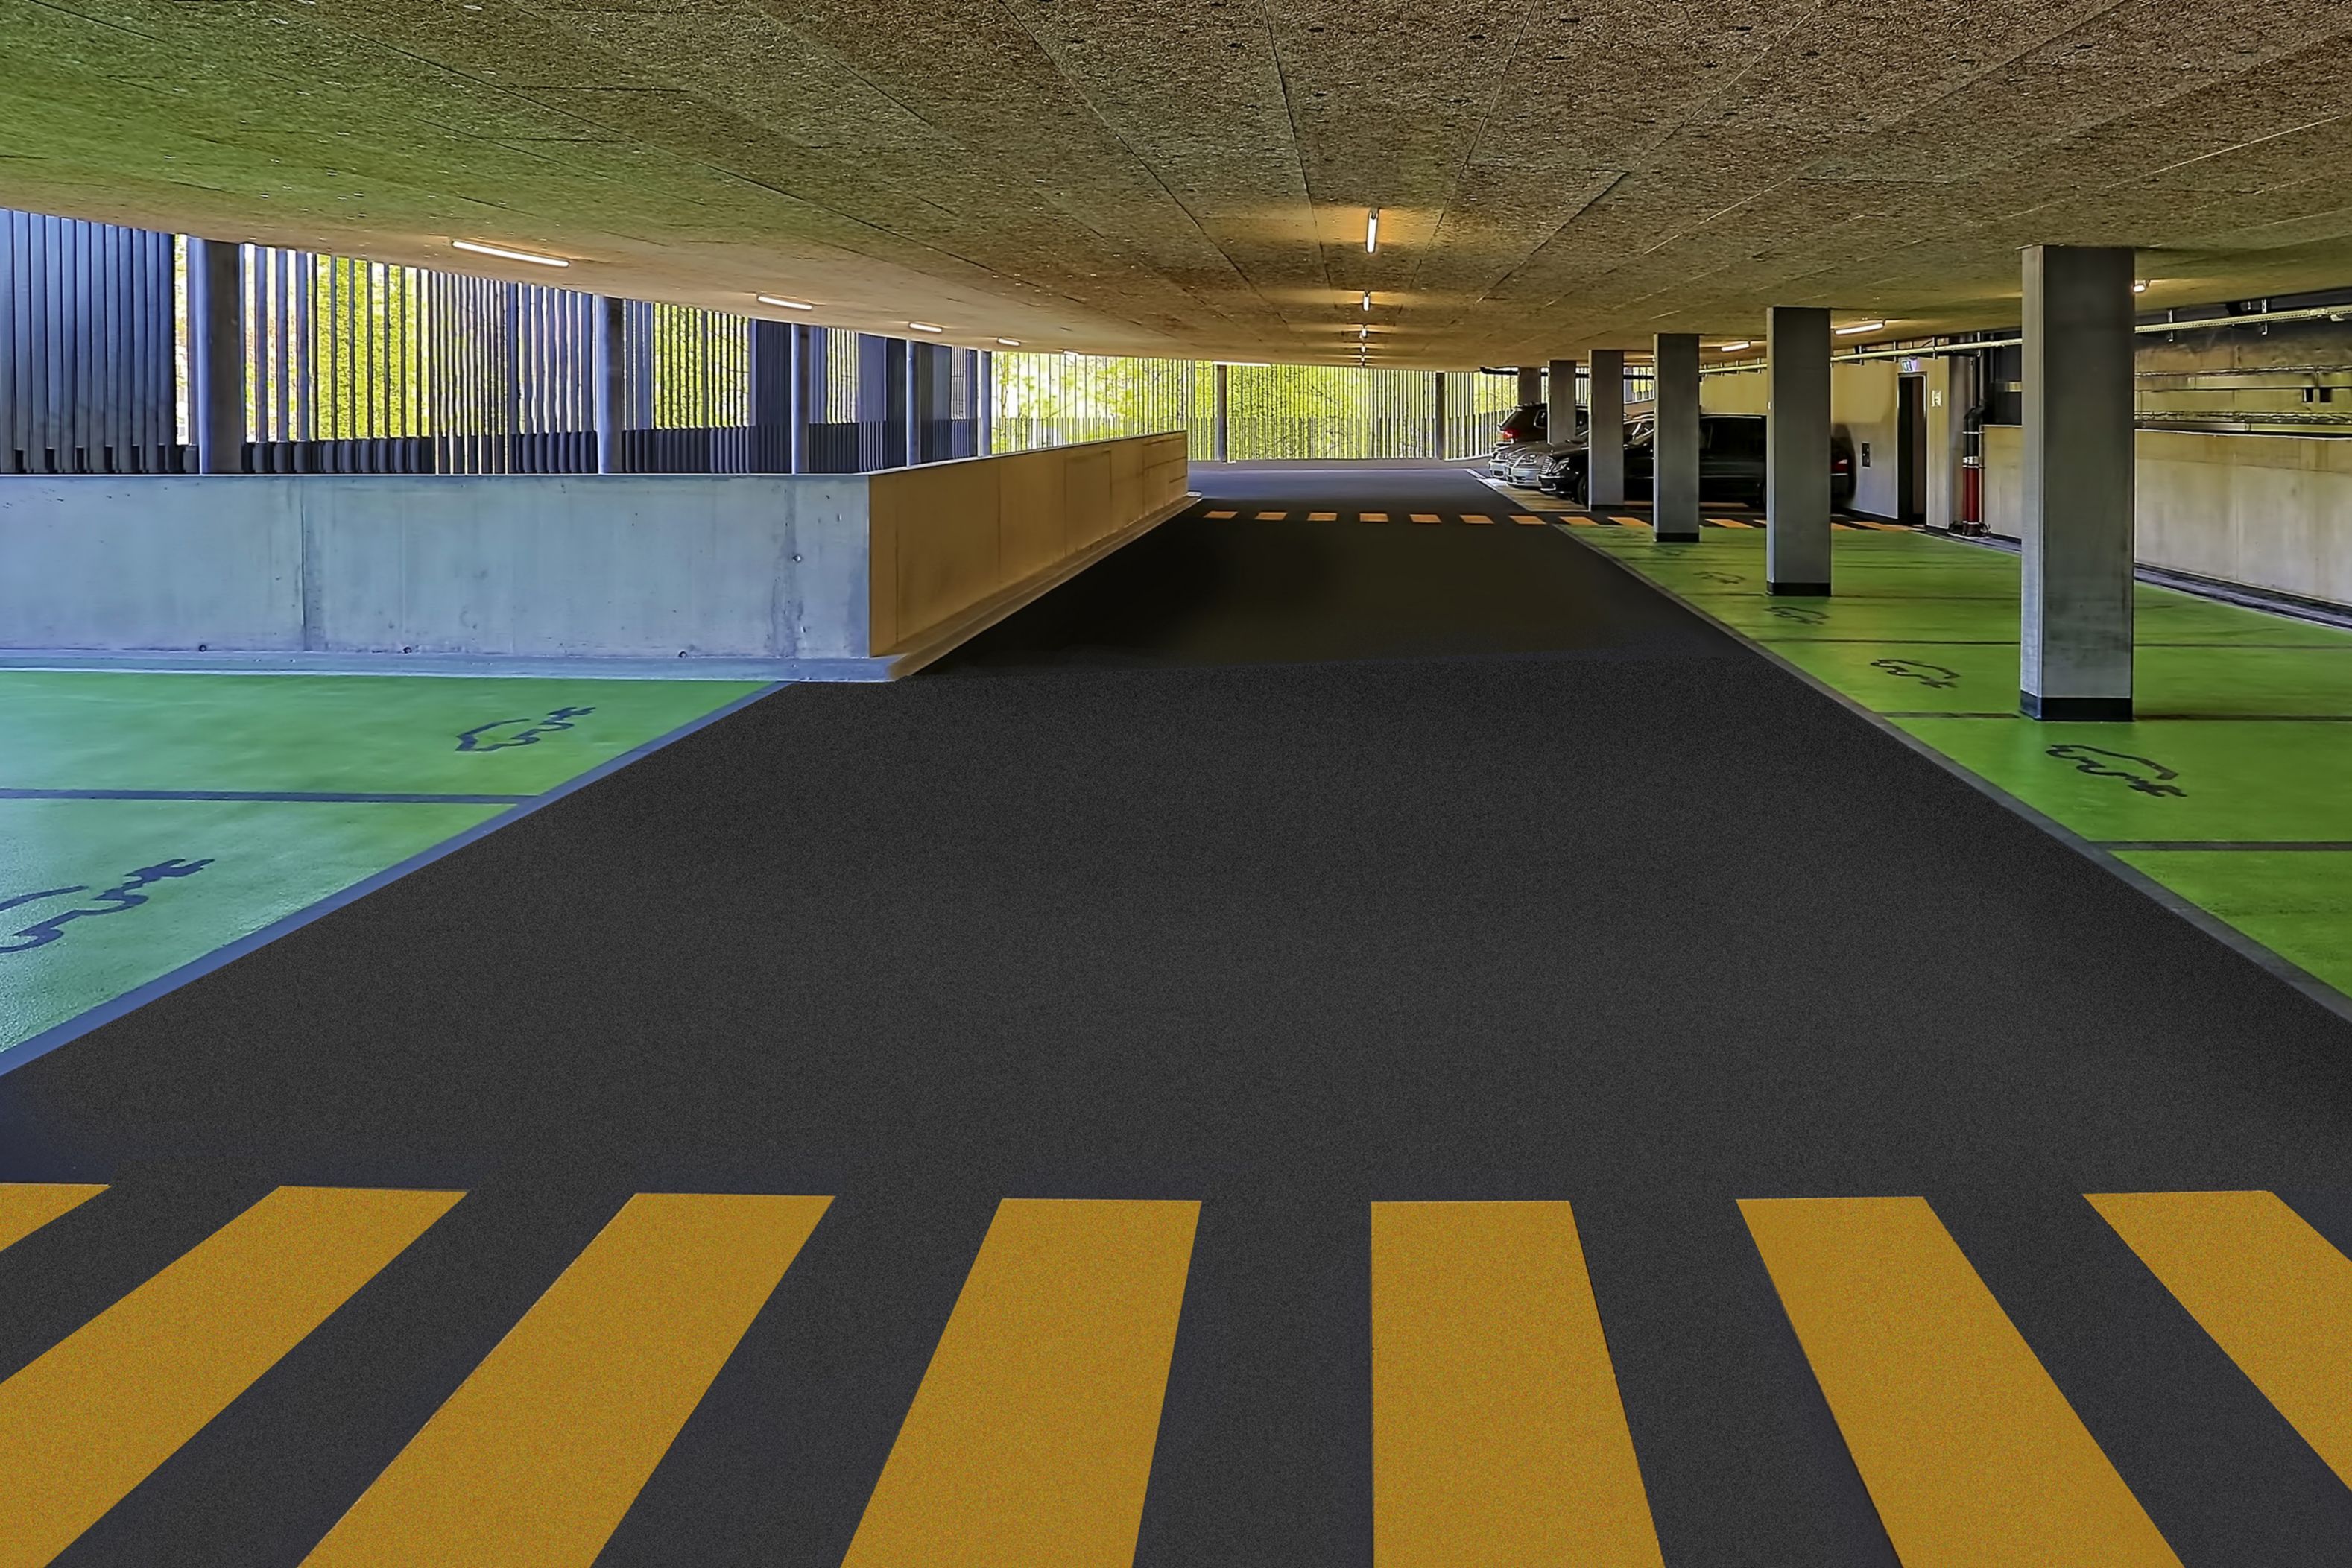 Colorful floor coating in car parking garage